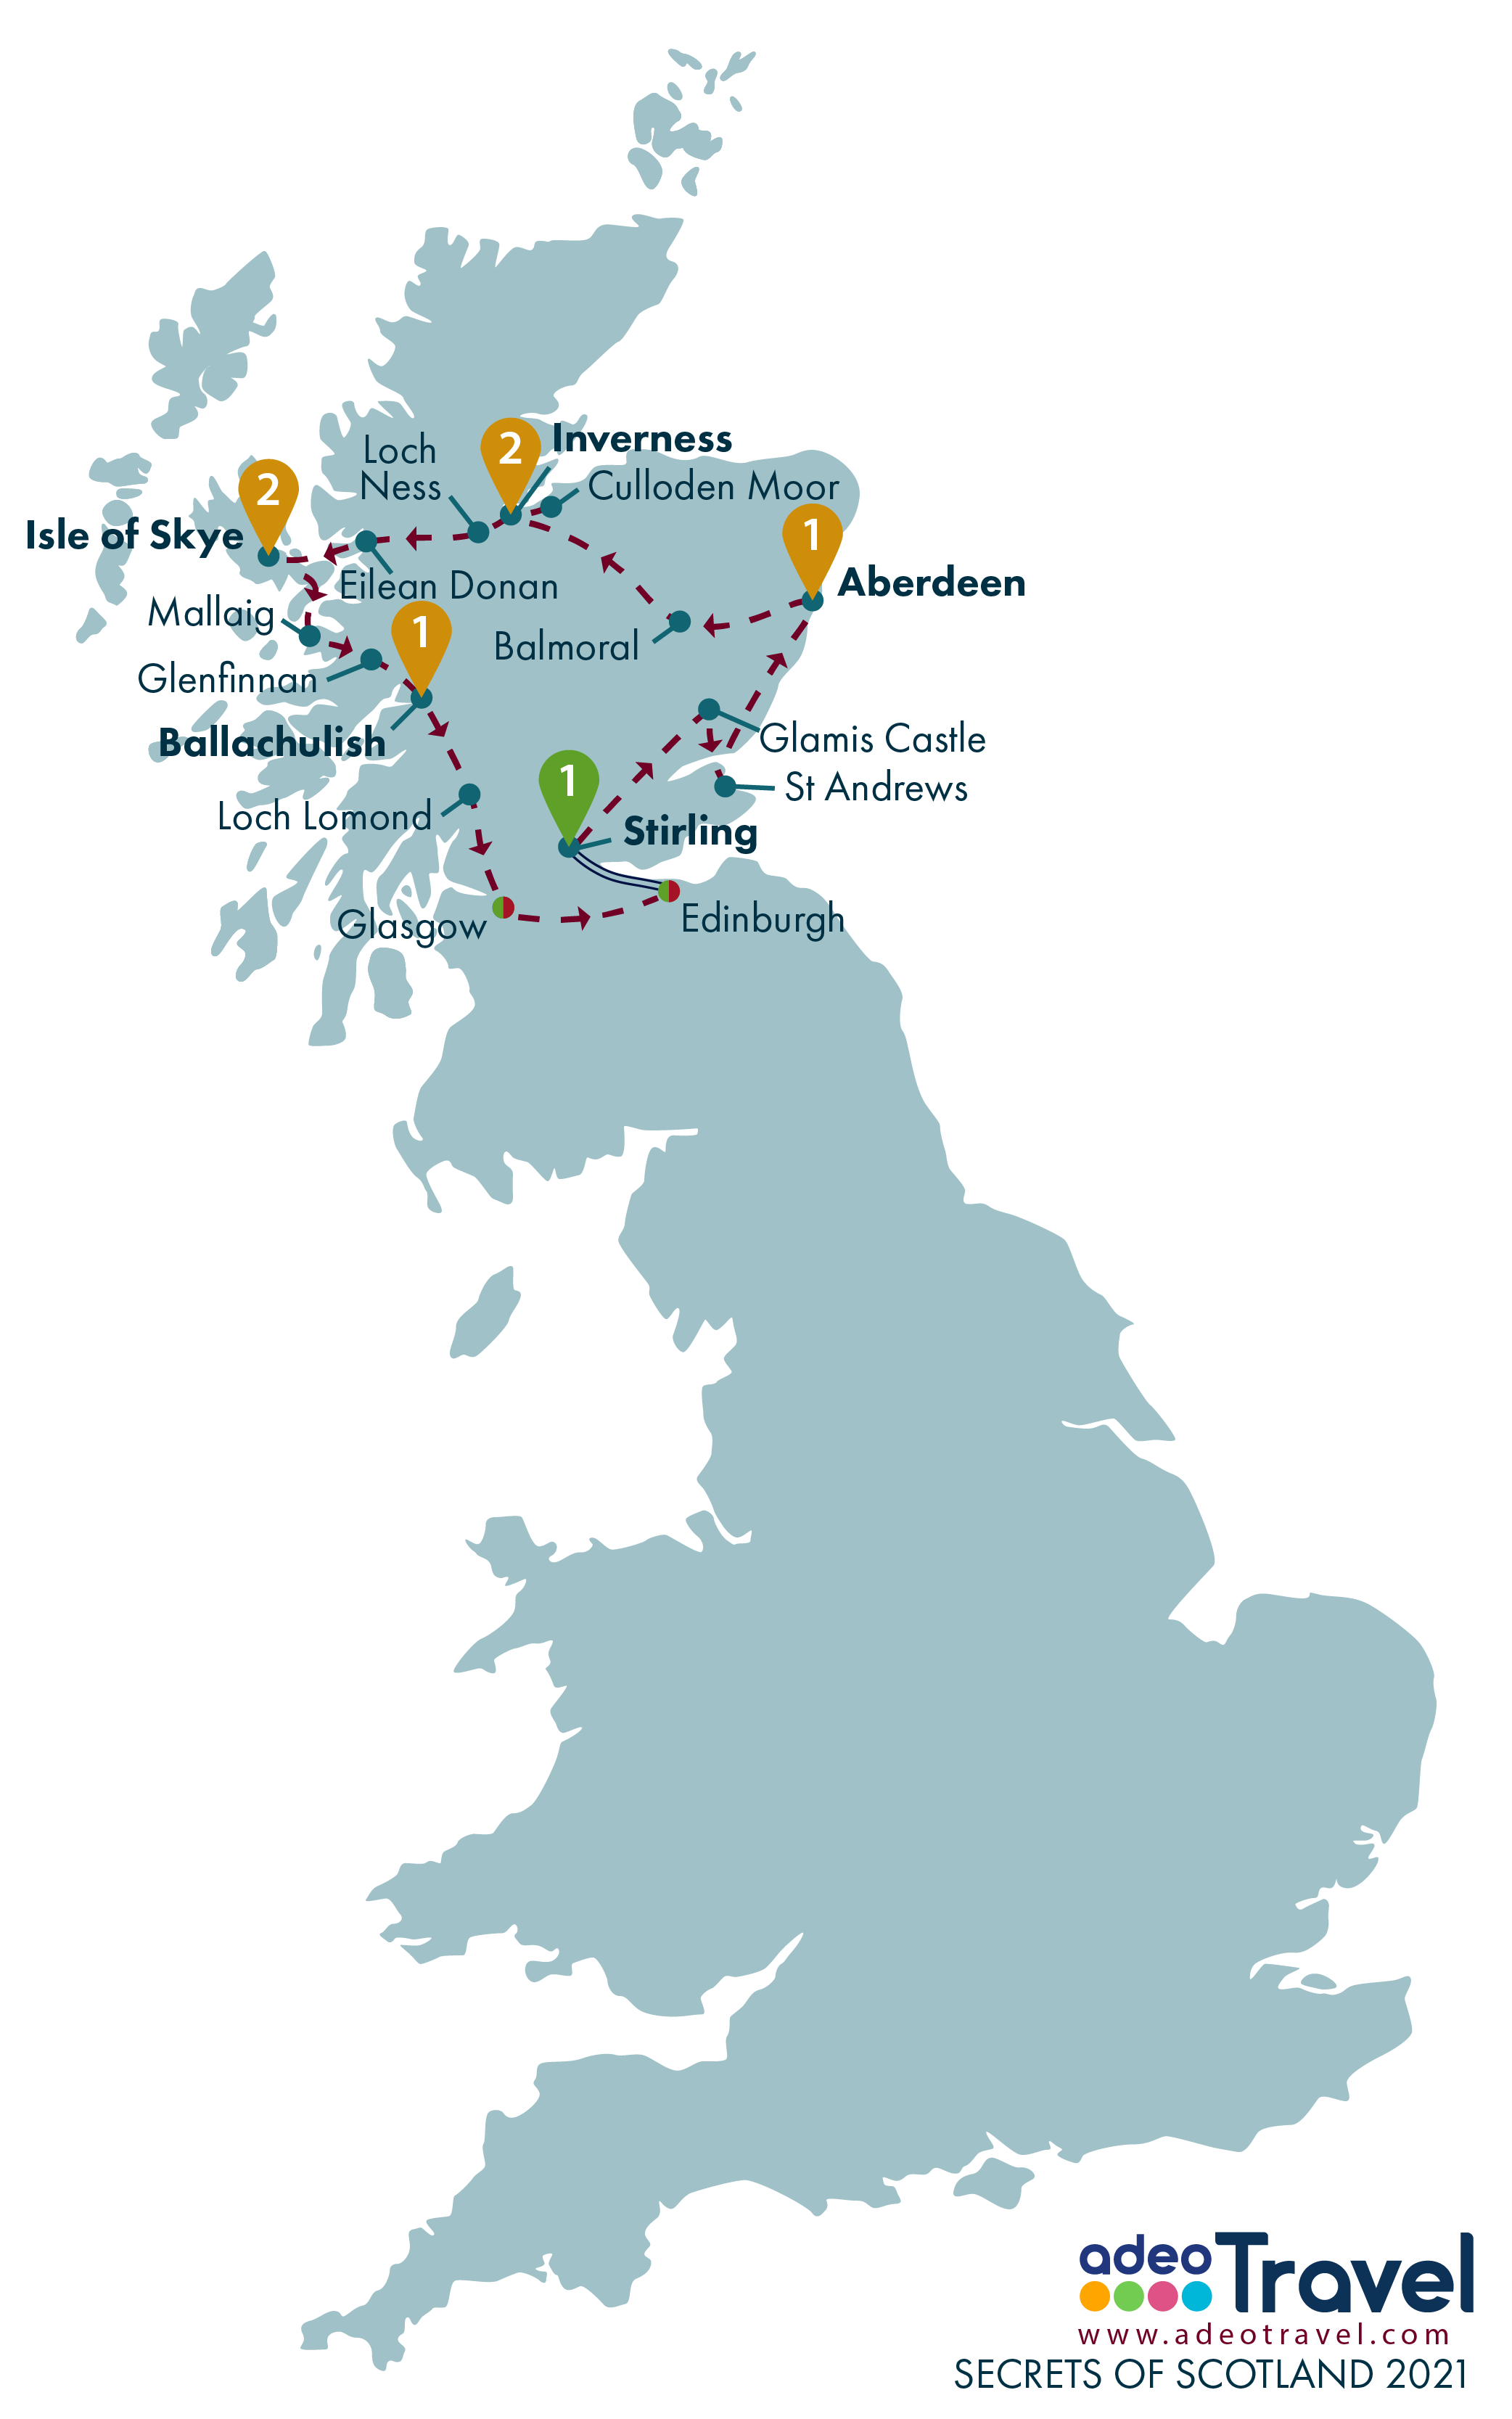 Map - Secrets of Scotland 2021